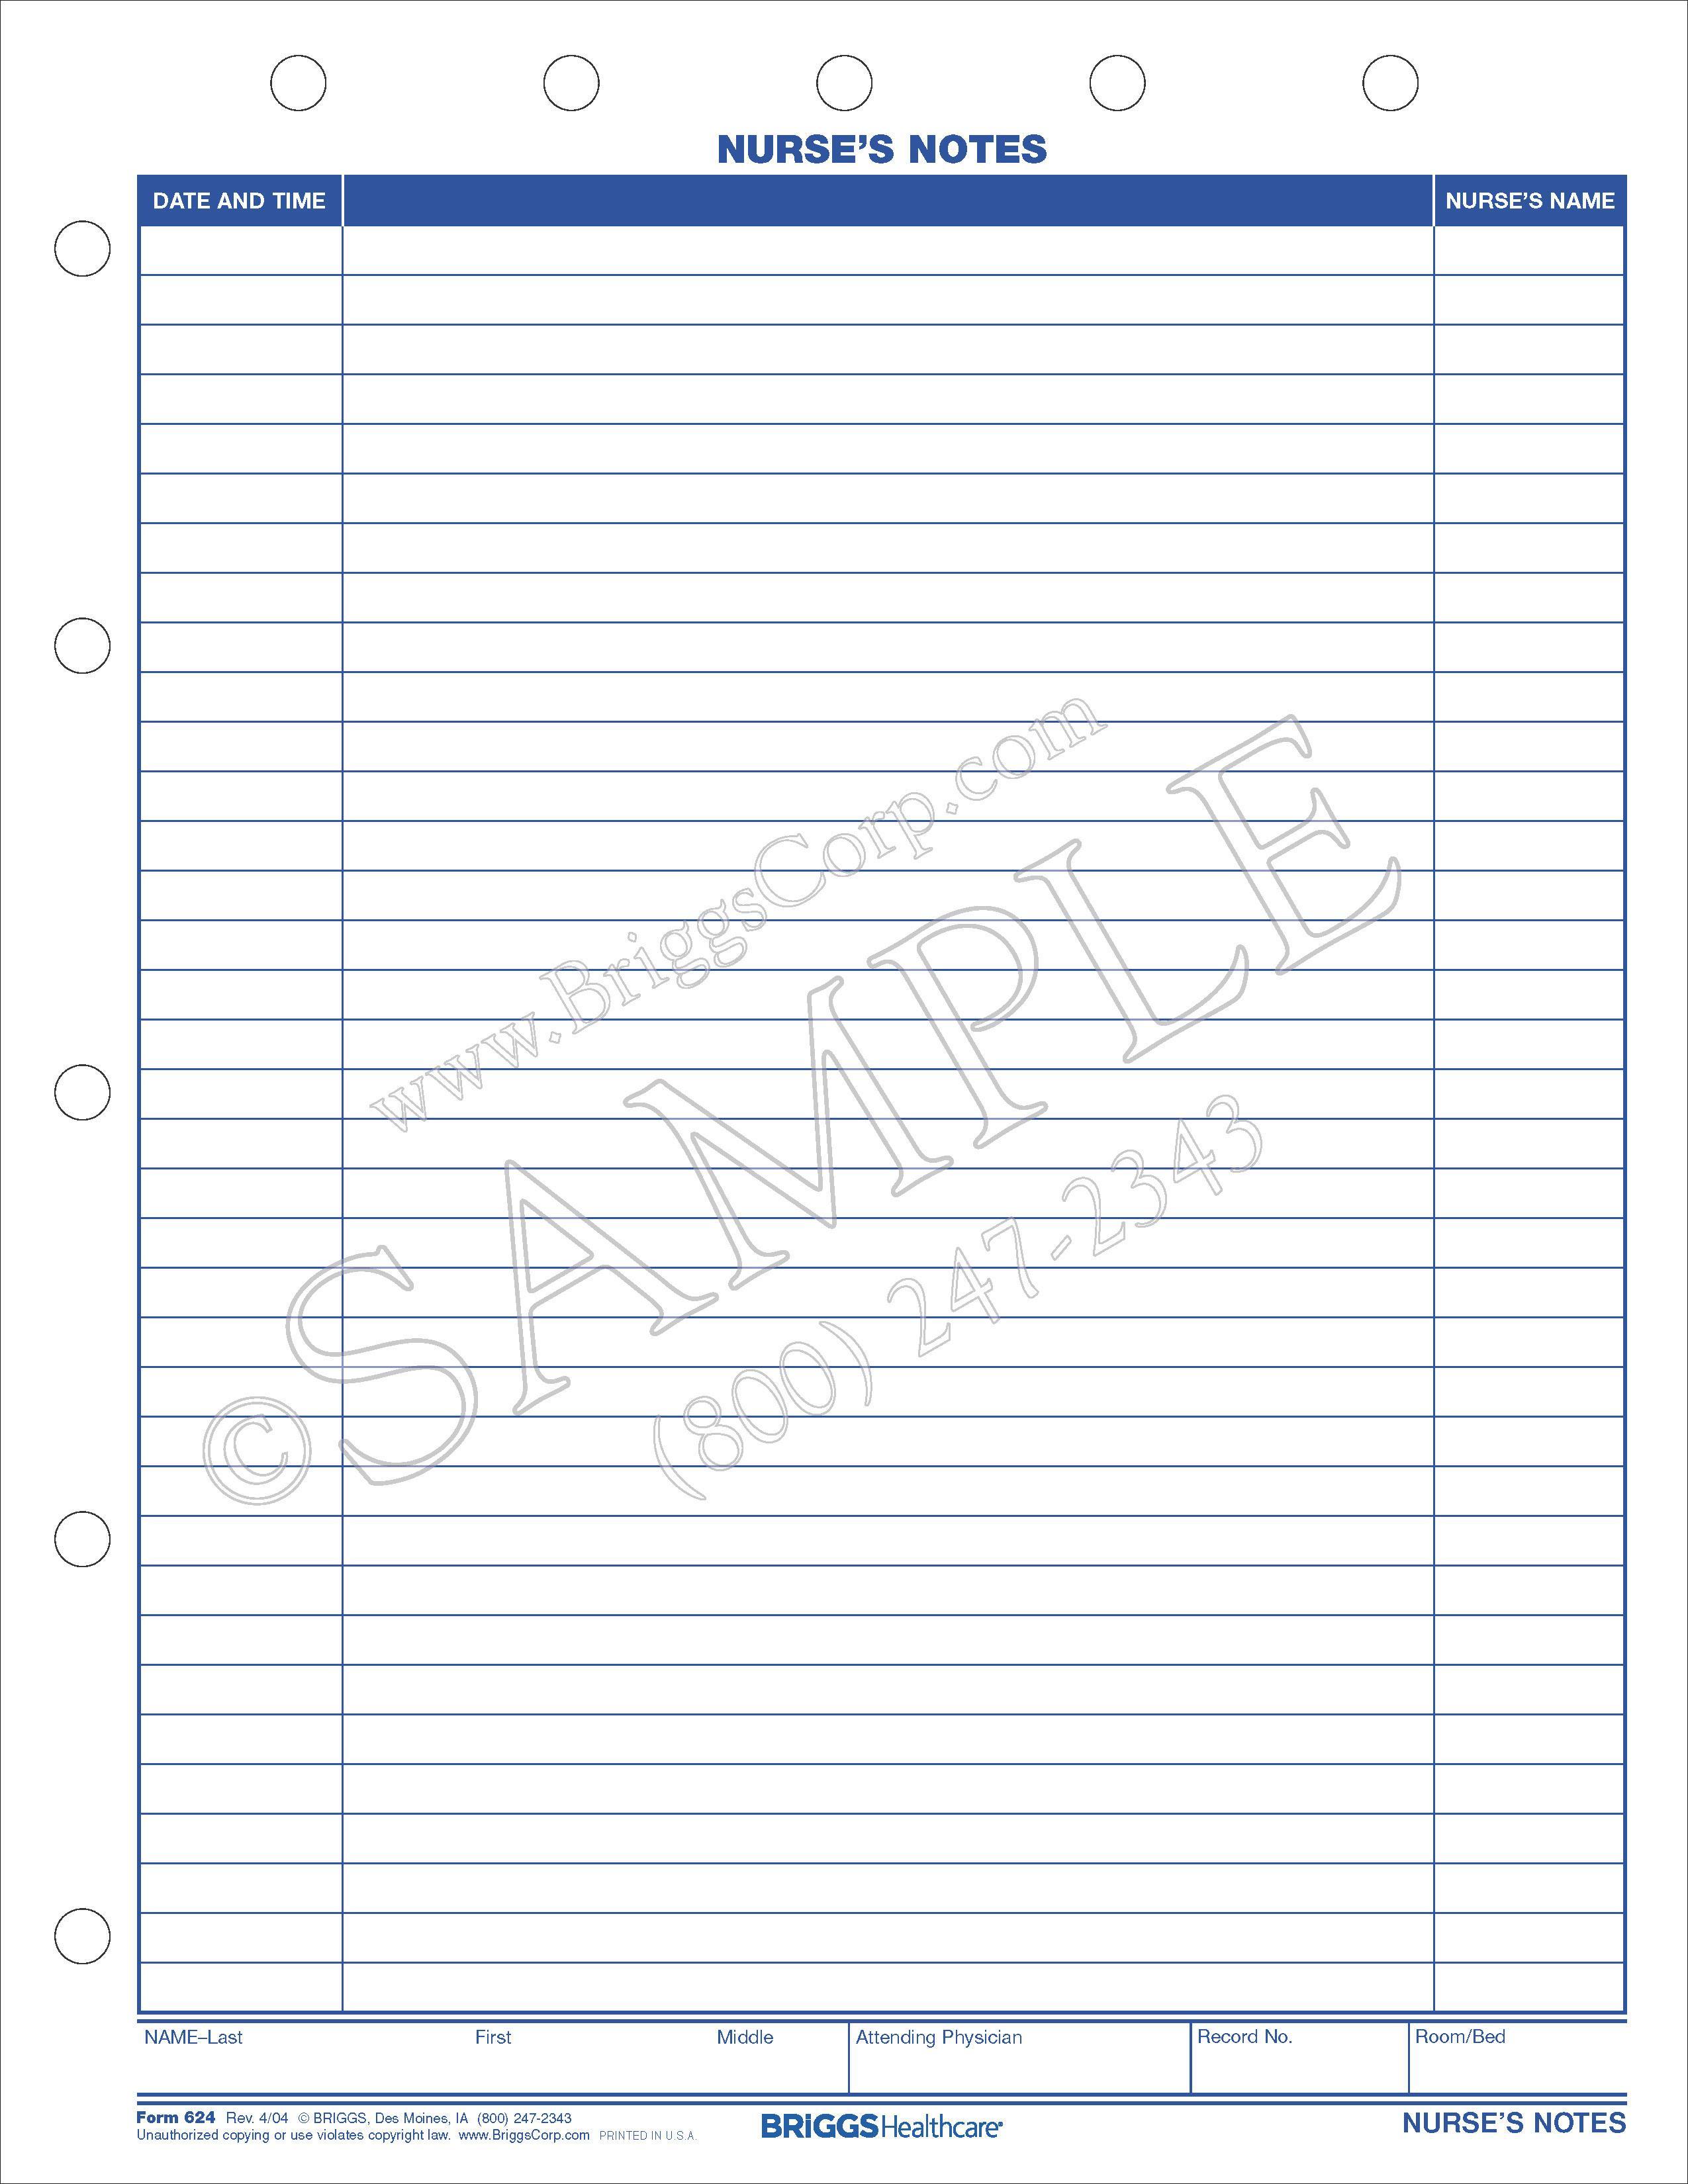 notes form - Parfu kaptanband co